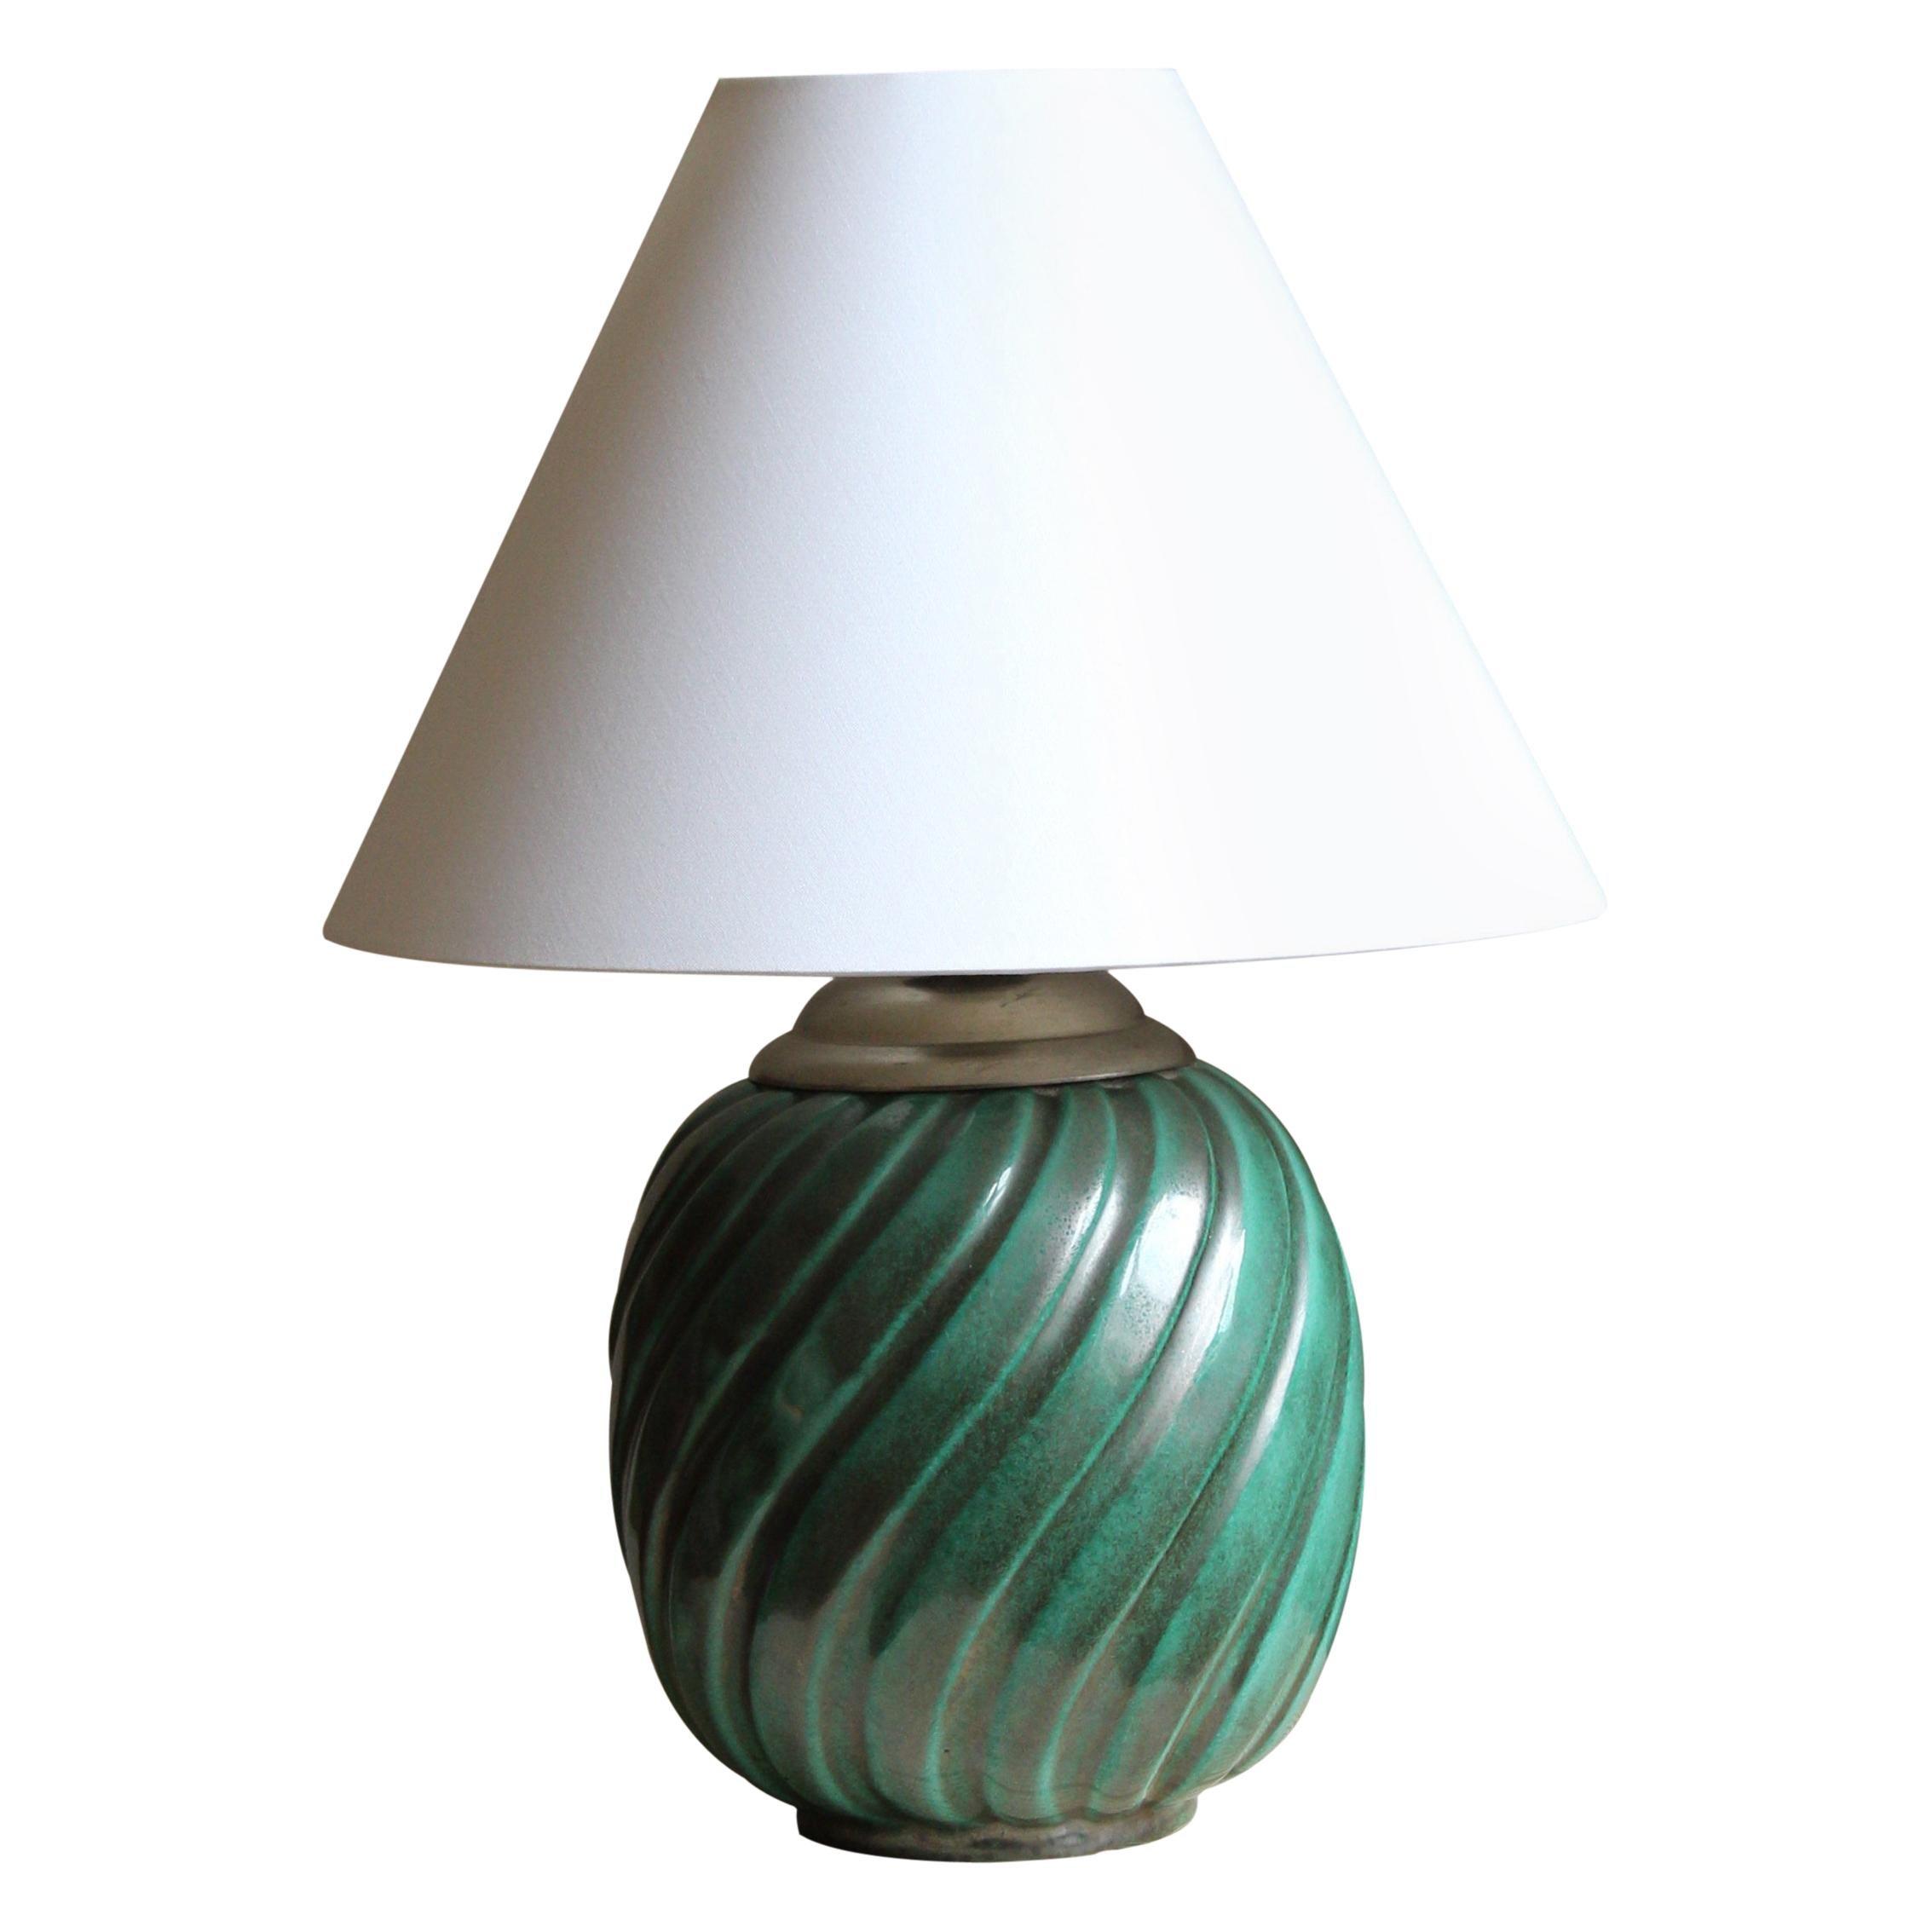 Ekeby, Rare Organic Table Lamp, Green-Glazed Stoneware, Sweden, 1930s